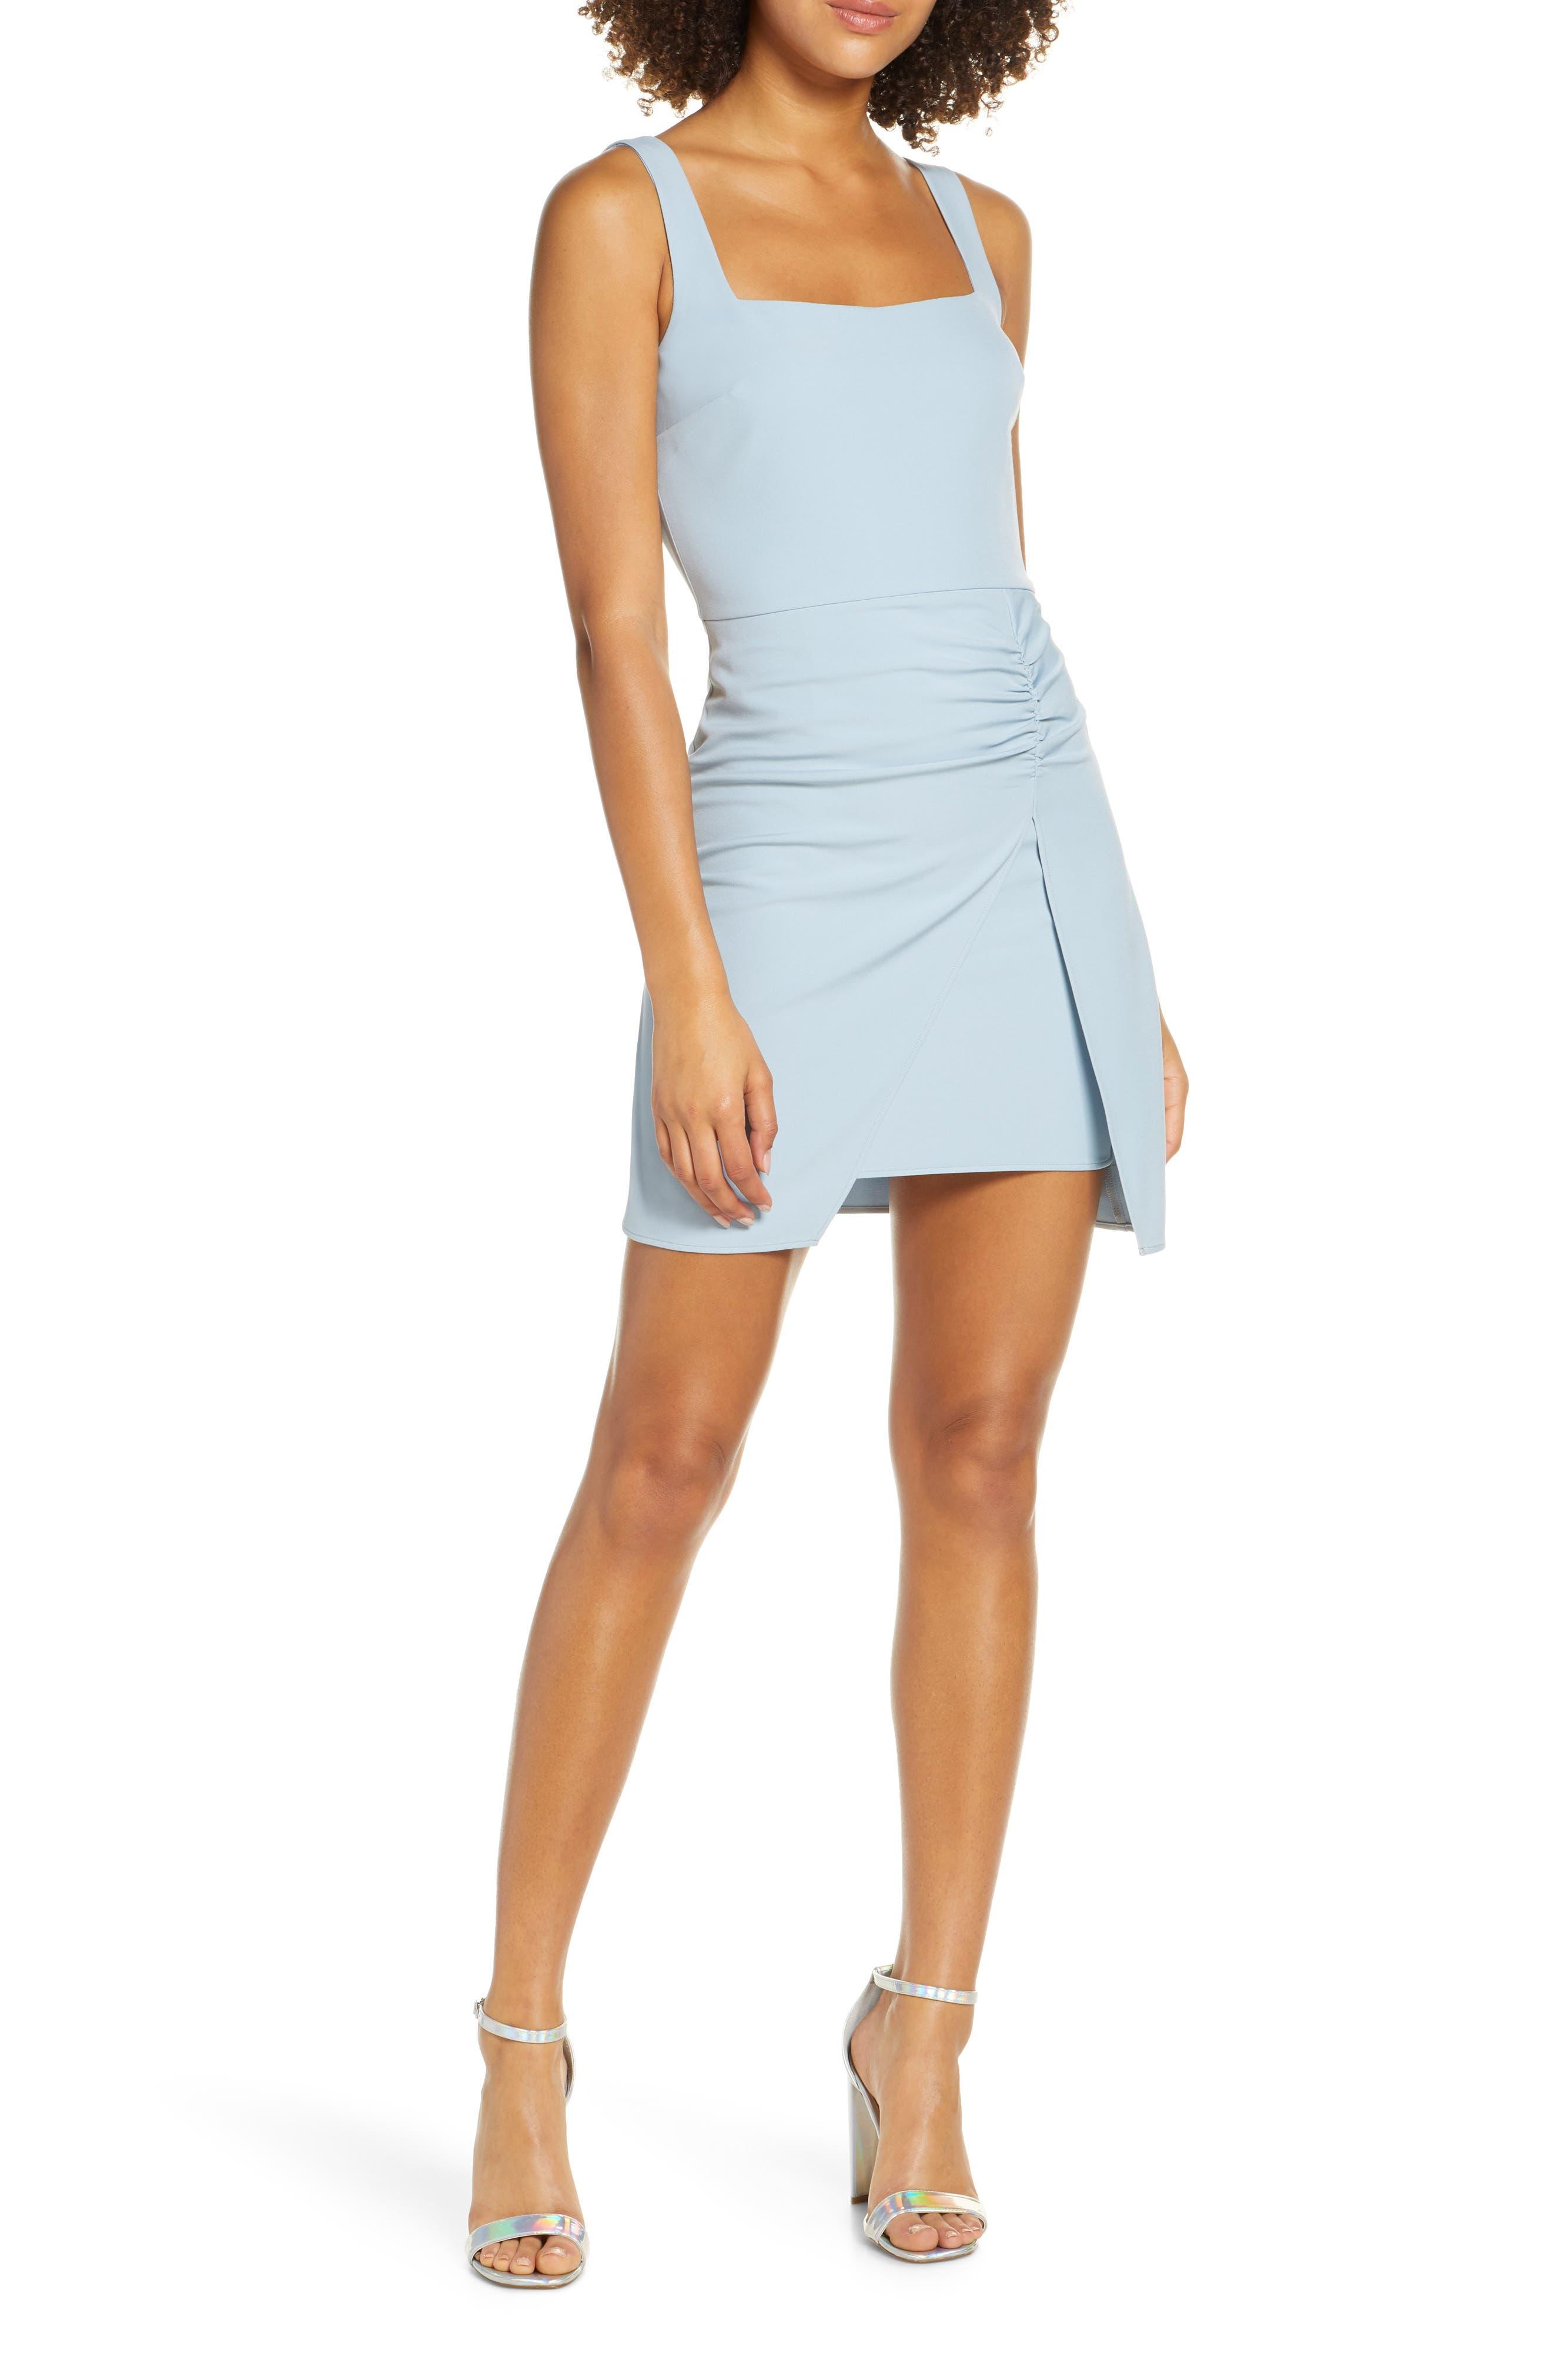 Nsr Chloe Ruched Minidress, Blue